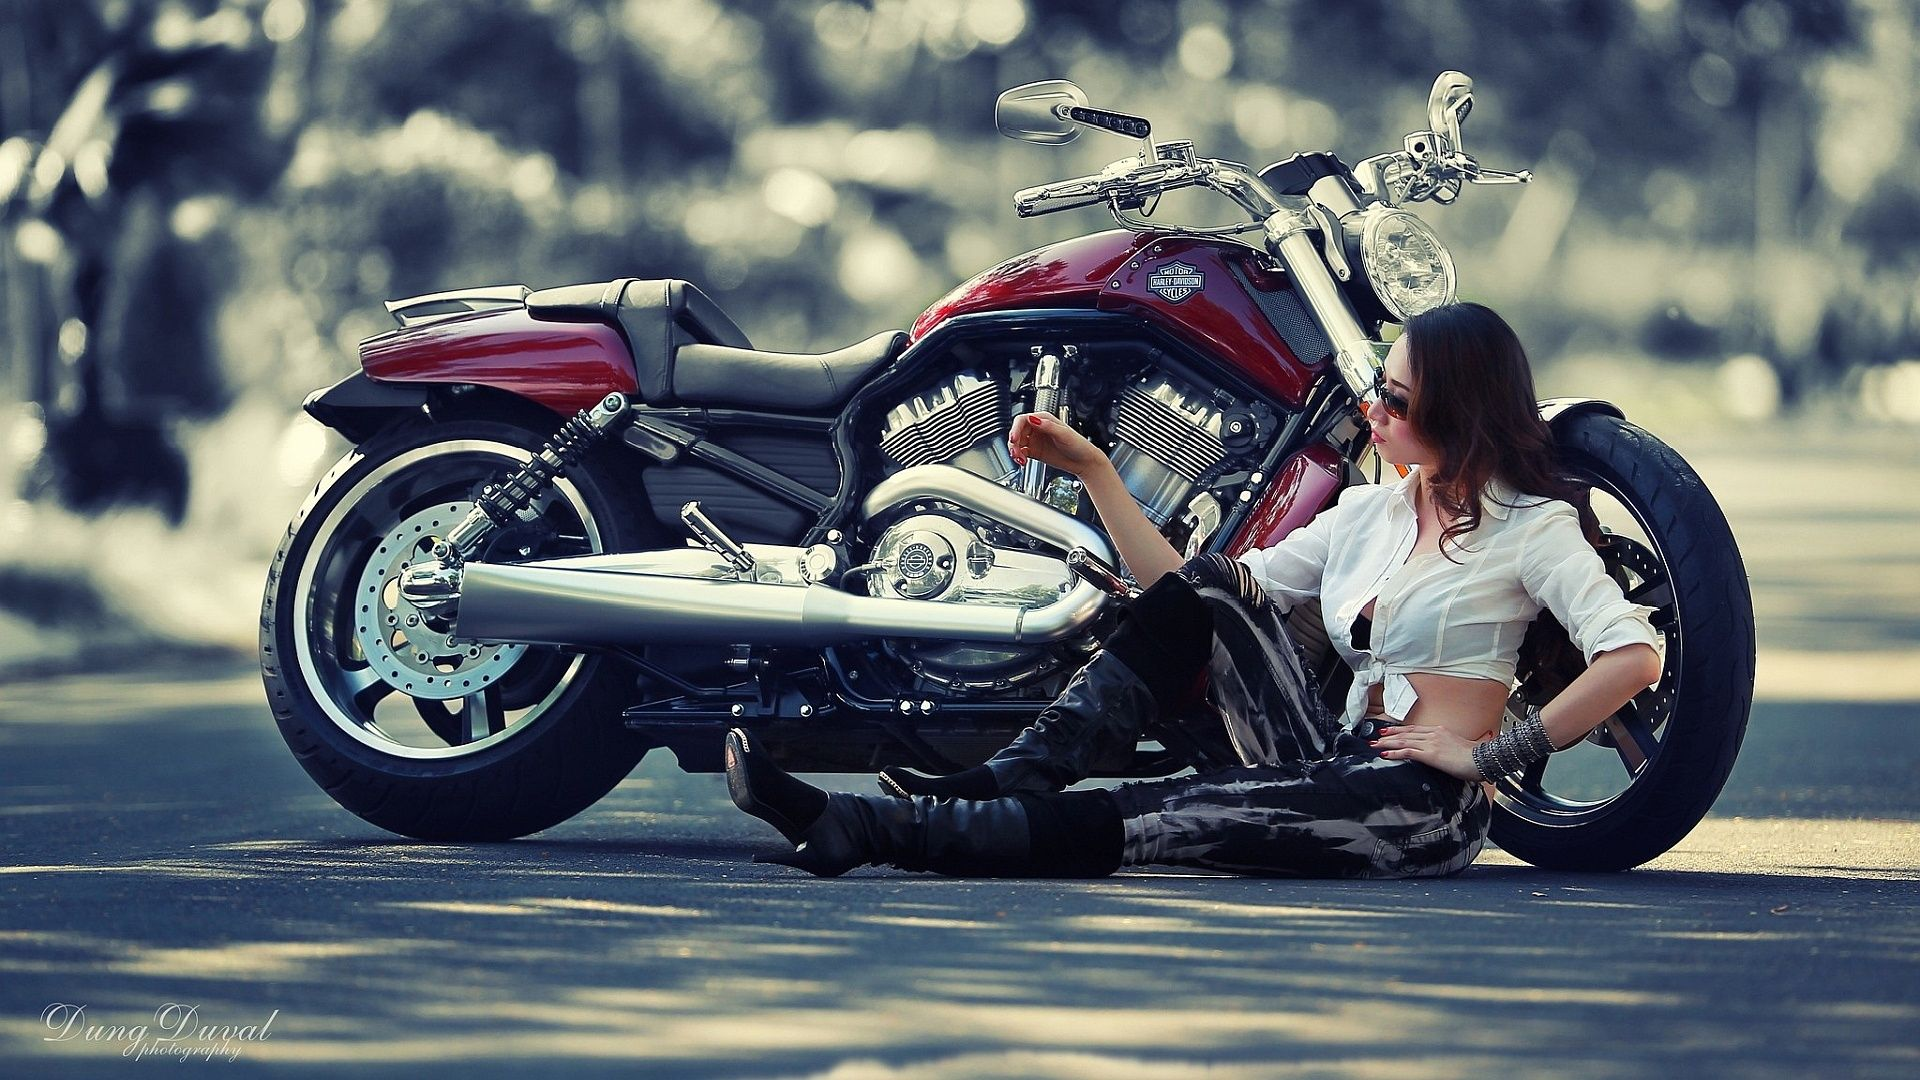 Description The Wallpaper Above Is Harley Davidson Girl In